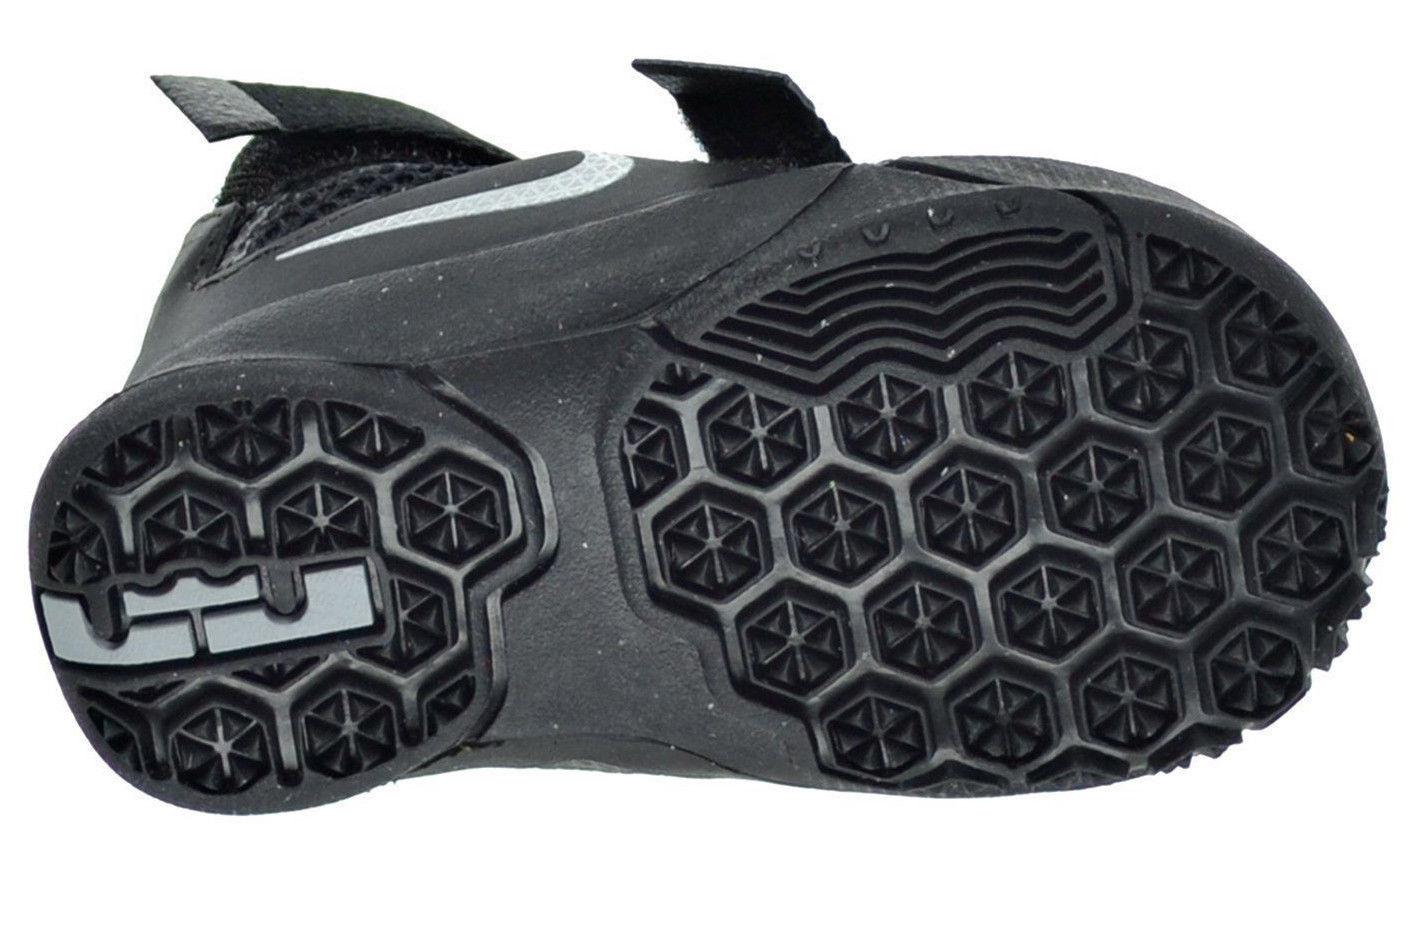 super popular 0eff1 25067 NIKE Lebron Soldier IX PS TD Toddler Shoes sz 5C Black Metallic Silver